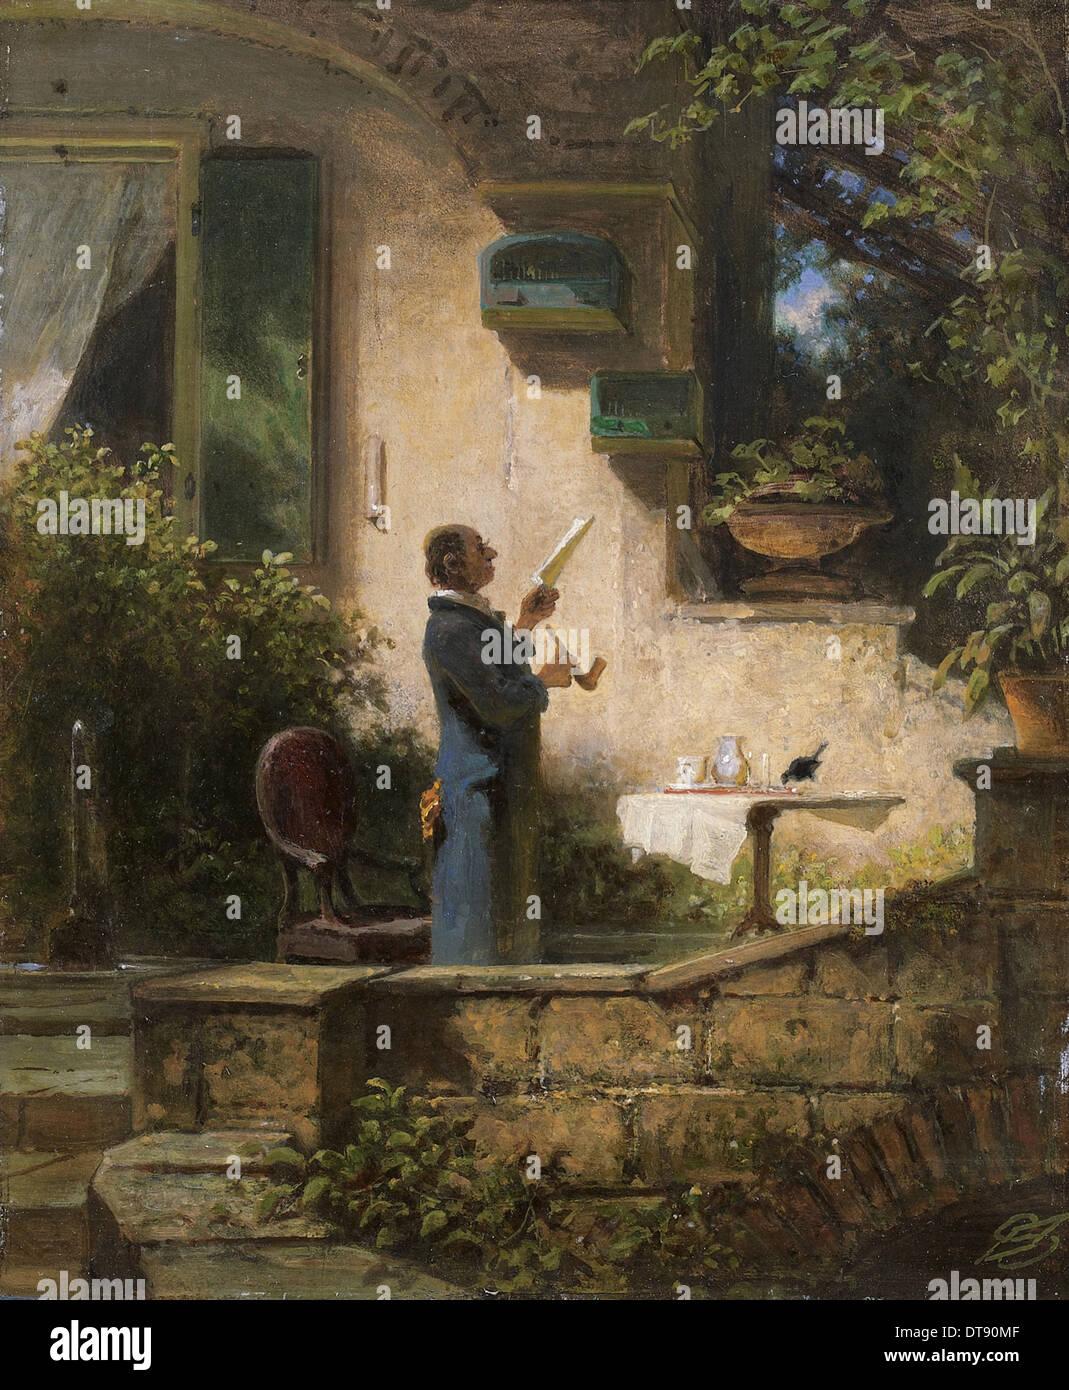 An important missive, 1870s. Artist: Spitzweg, Carl (1808-1885) - Stock Image